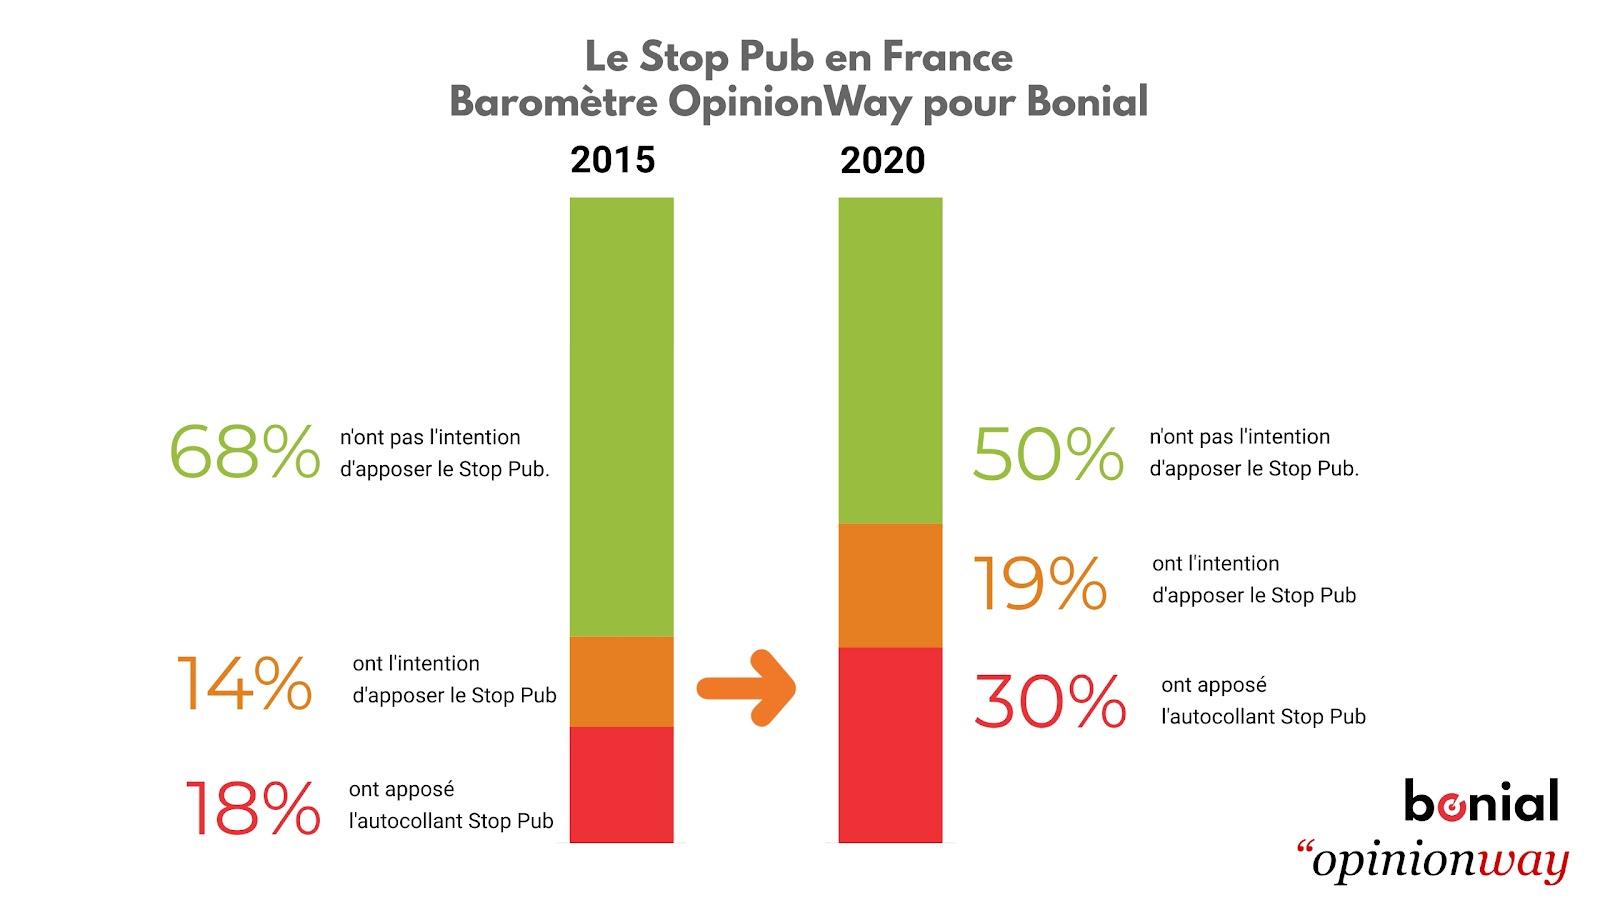 Sondage OpinionWay Bonial prospectus 2025 stop pub